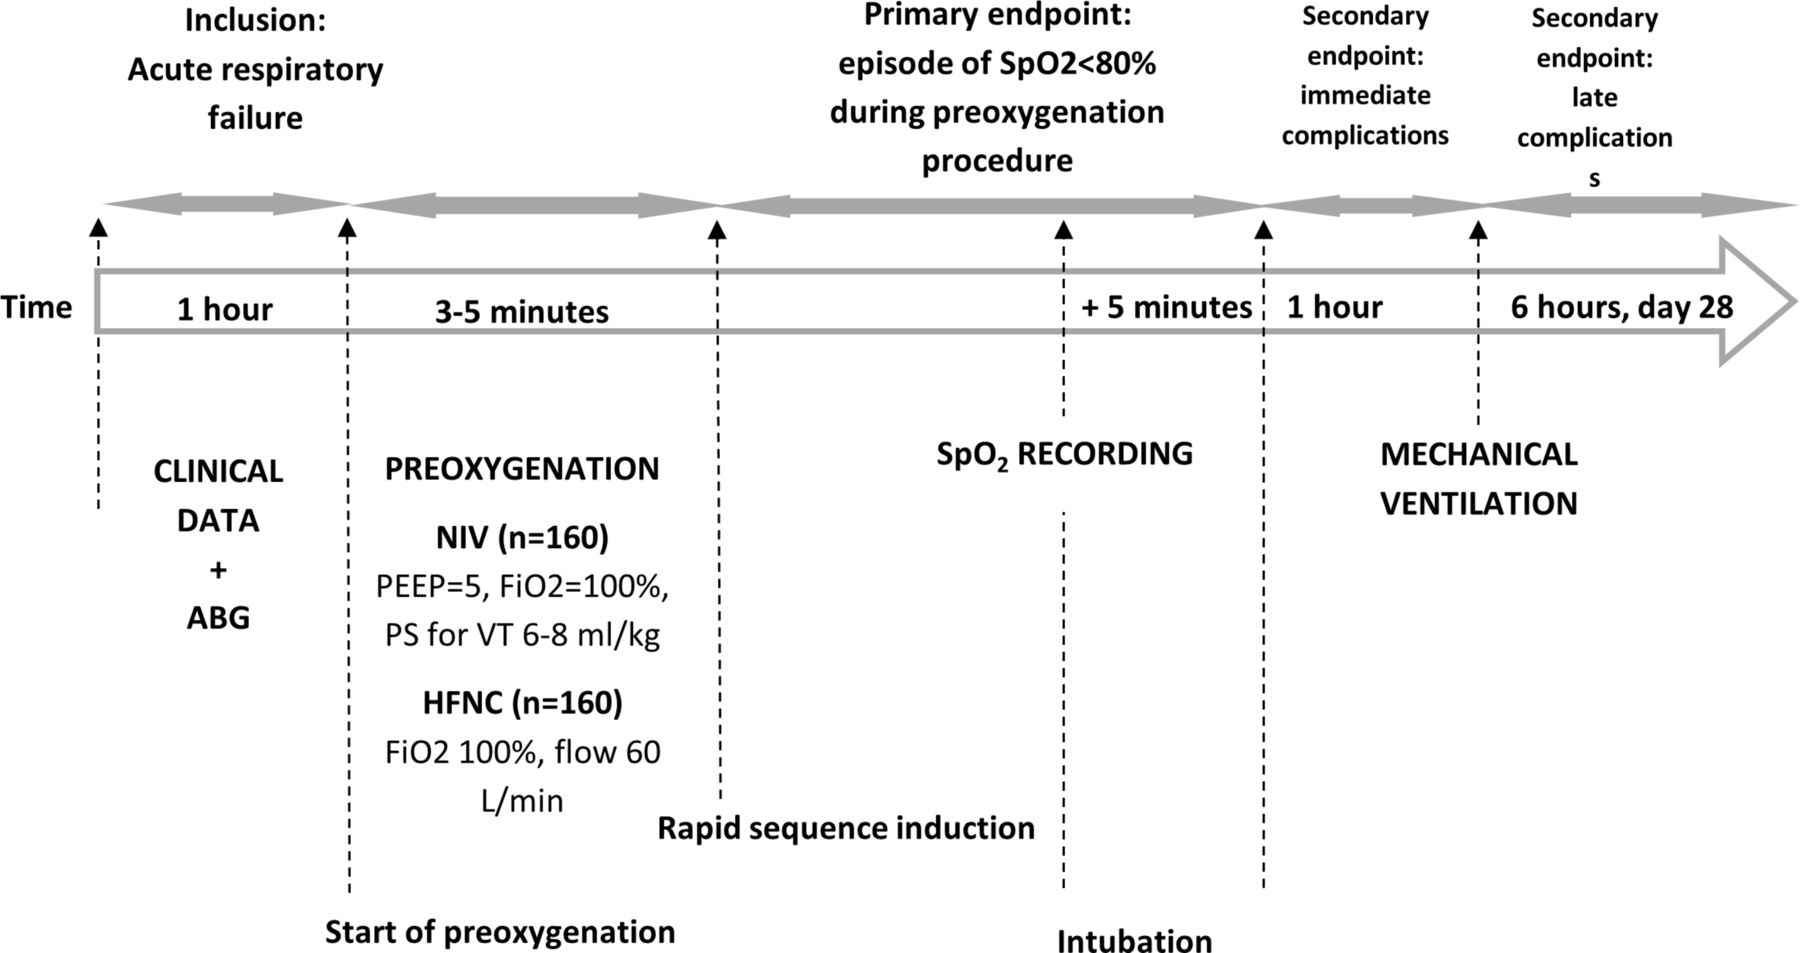 preoxygenation with non